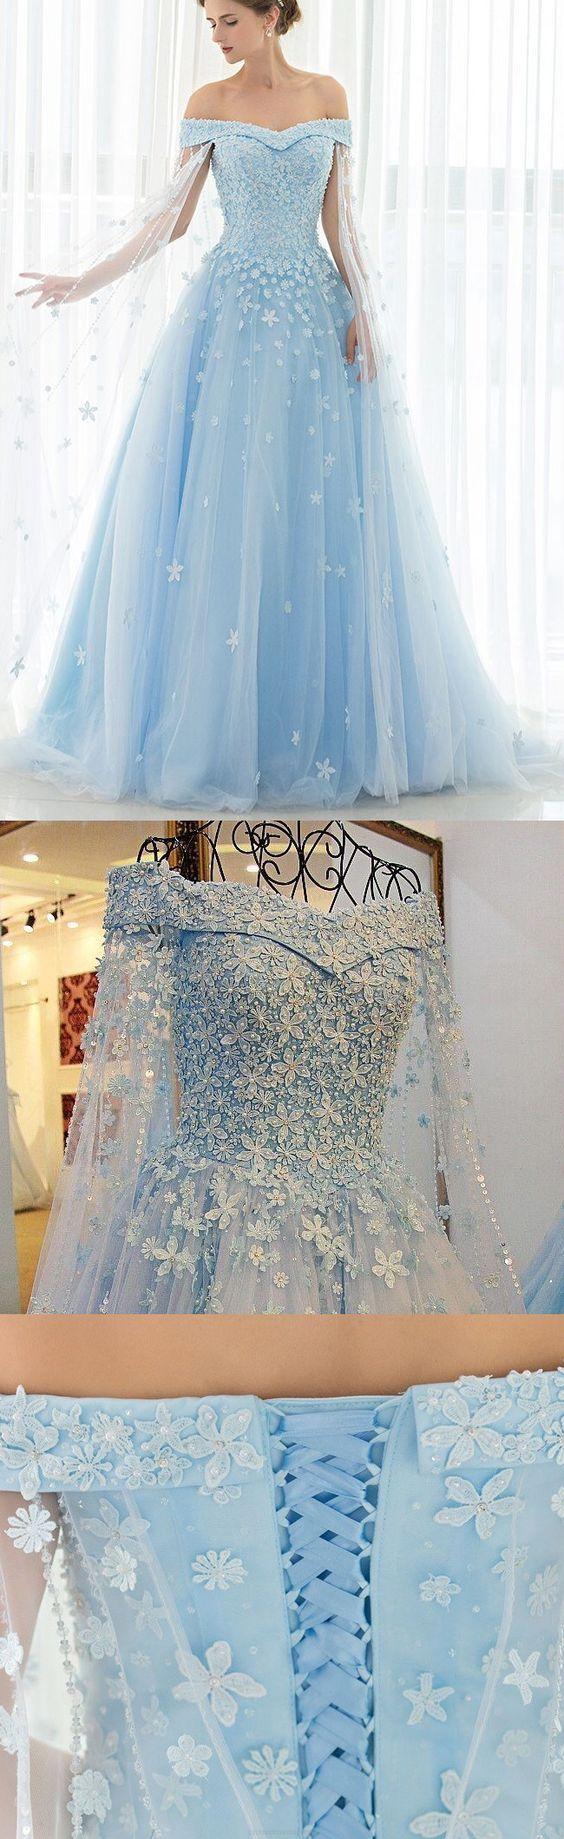 Blue Prom Dresses, Long Prom Dresses,  #promdresses #longpromdress #2018promdresses #fashionpromdresses #charmingpromdresses #2018newstyles #fashions #styles